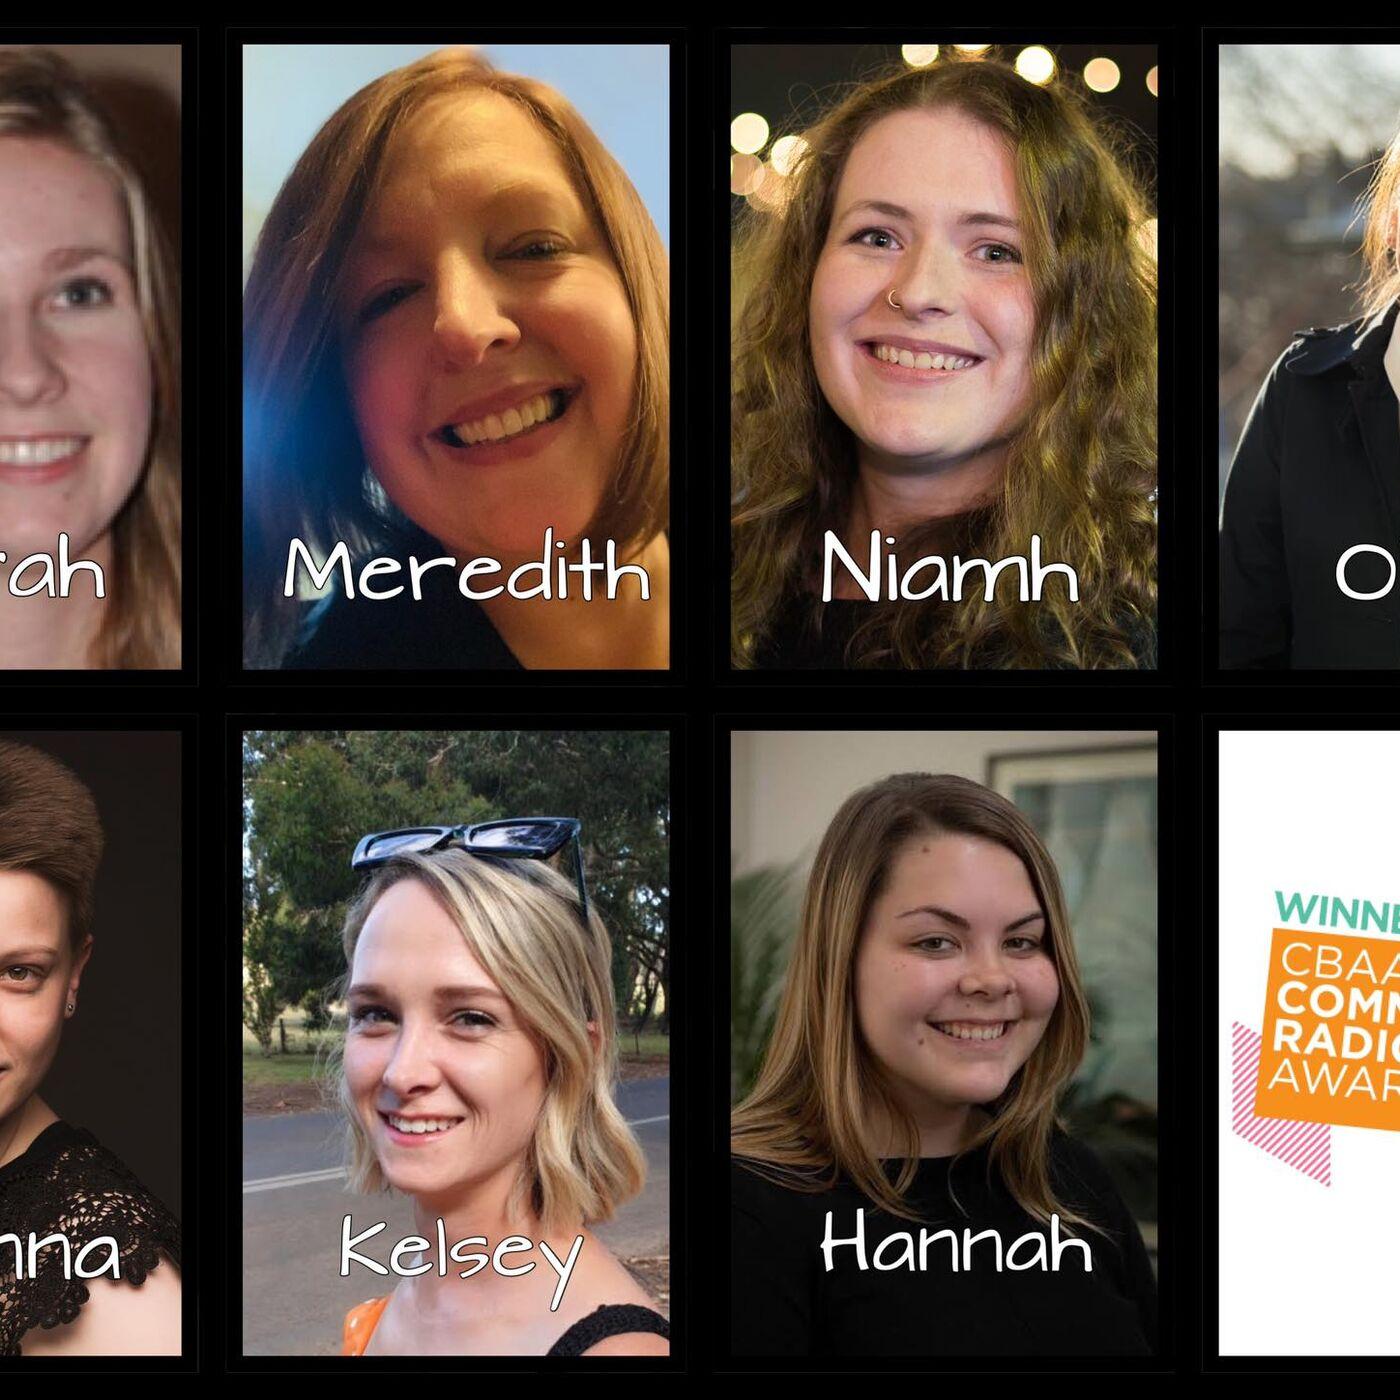 Episode 50: International Women's Day Part 1 - The Co-Hosts